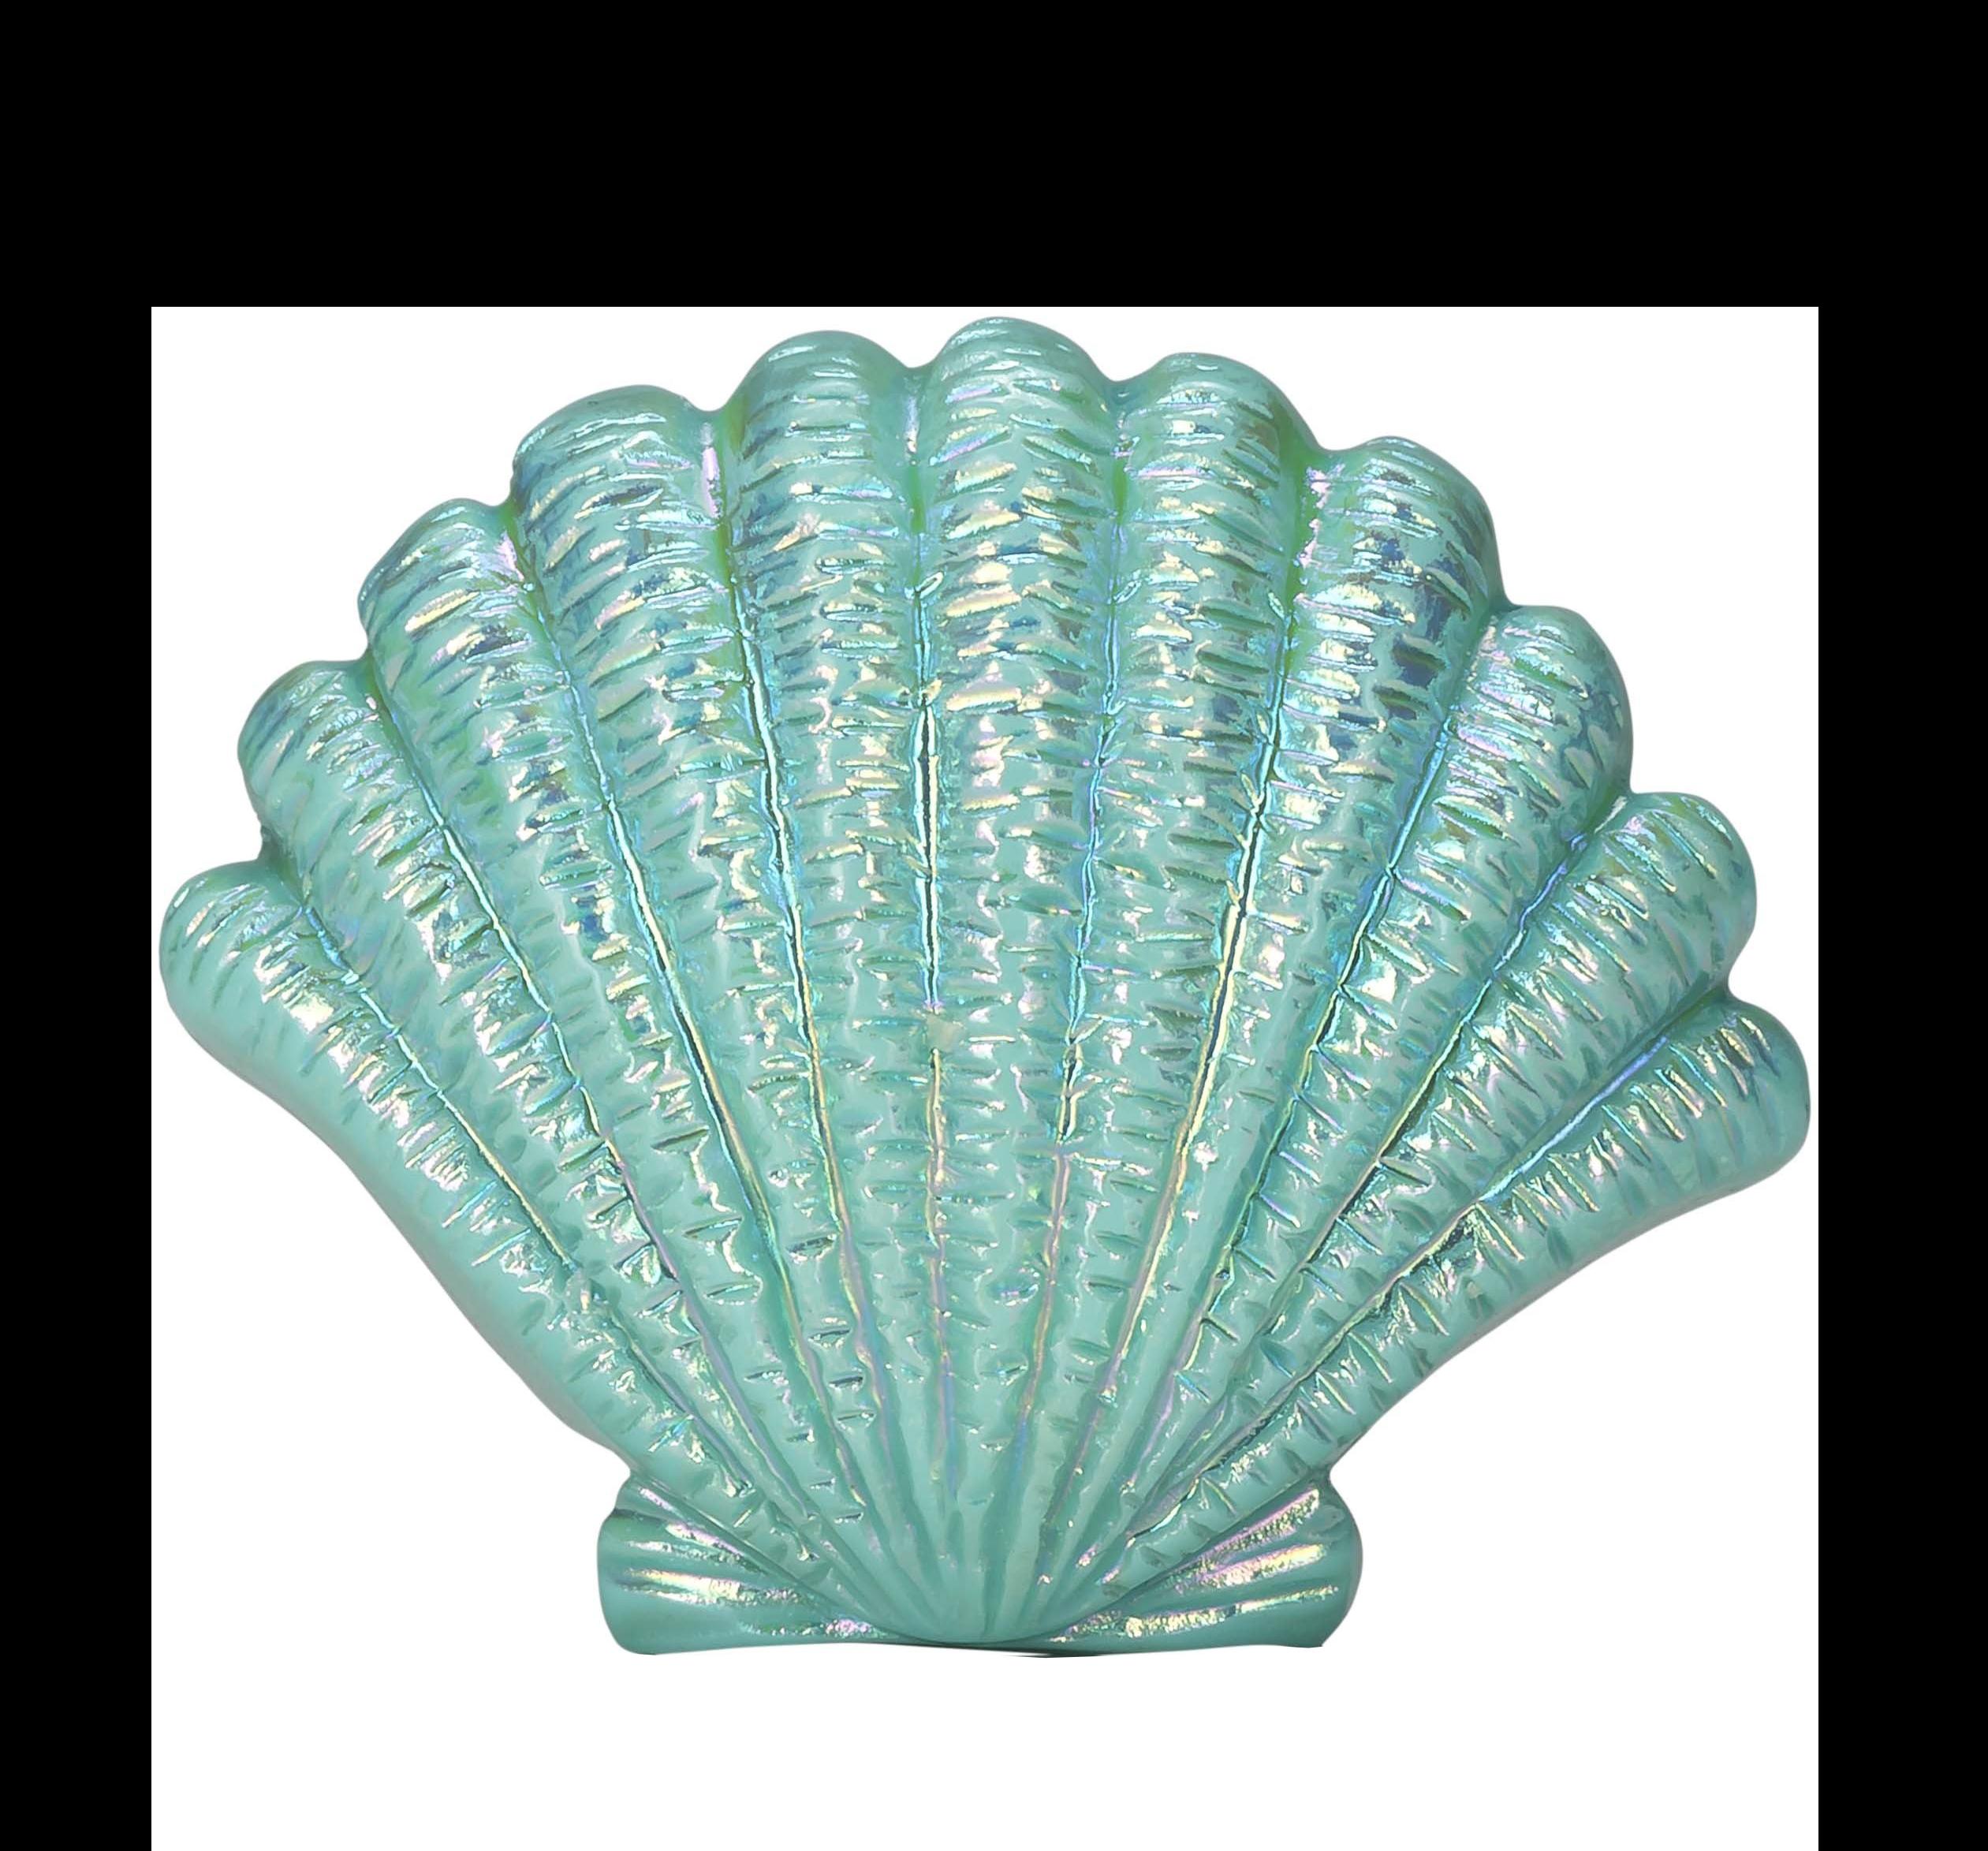 blue seashell png image purepng free transparent cc0 png image library clipart seahorses and shells clip art seashore